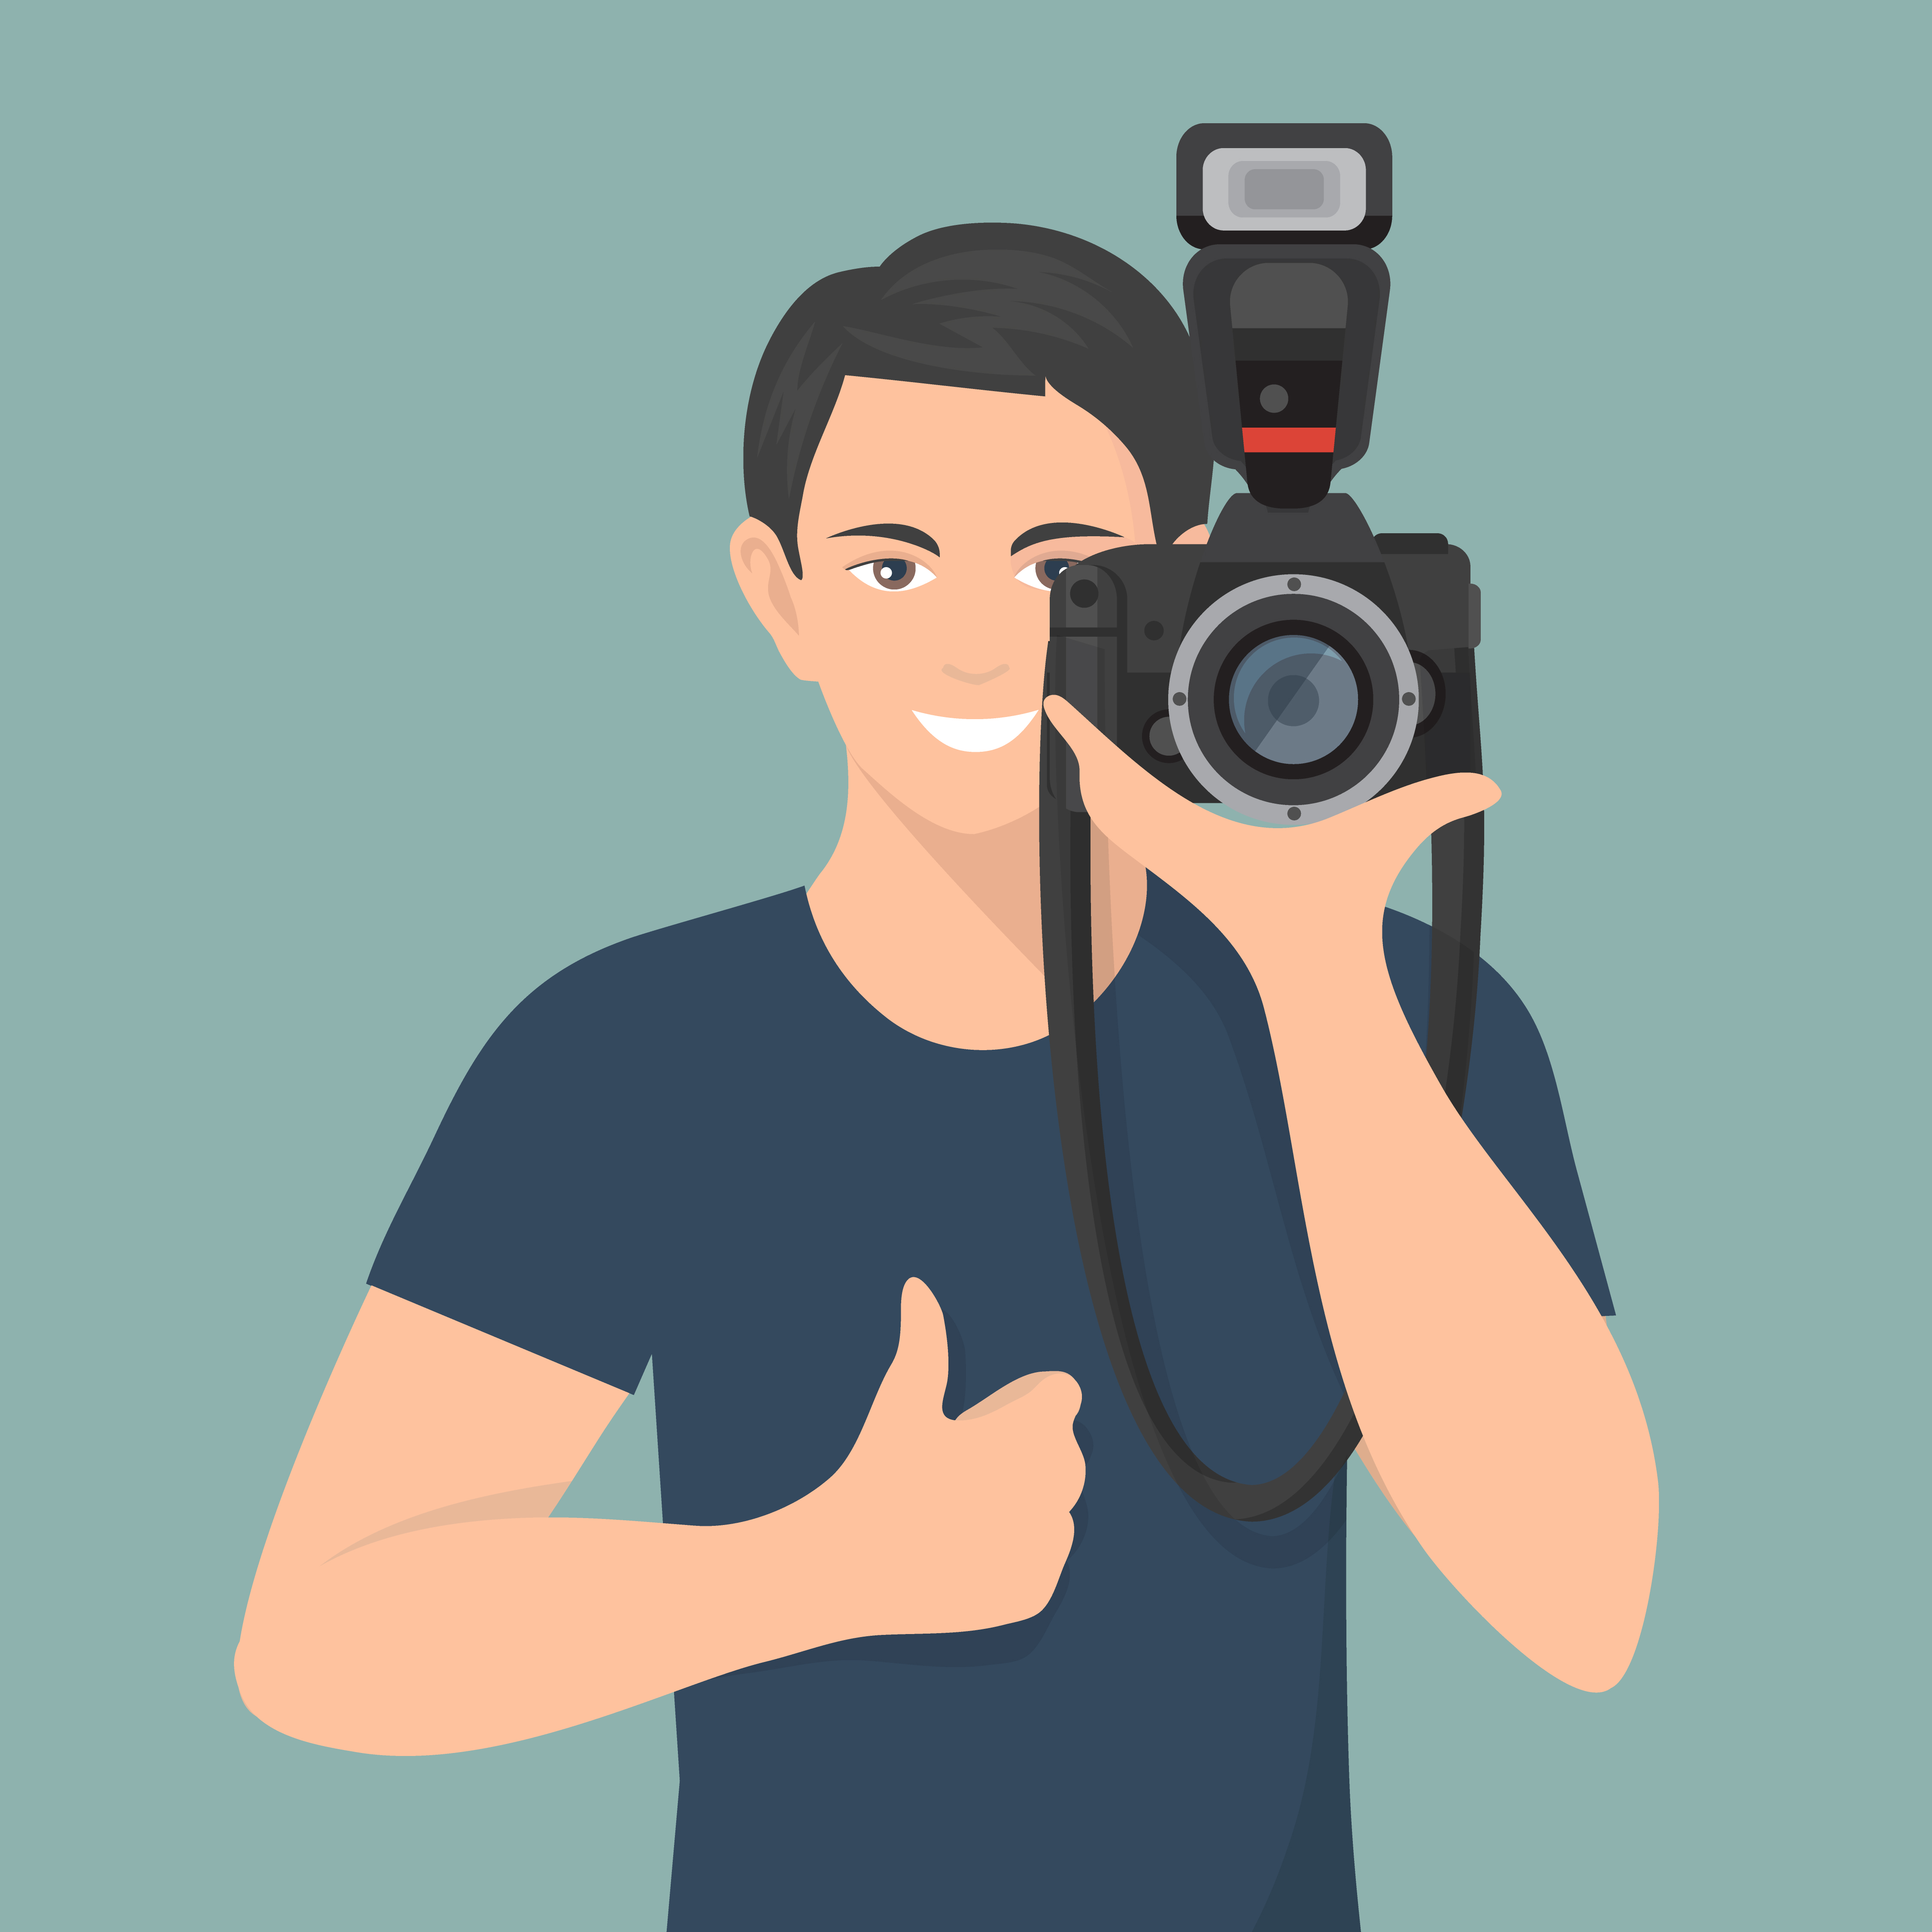 photographer flat illustration download free vectors clipart graphics vector art vecteezy